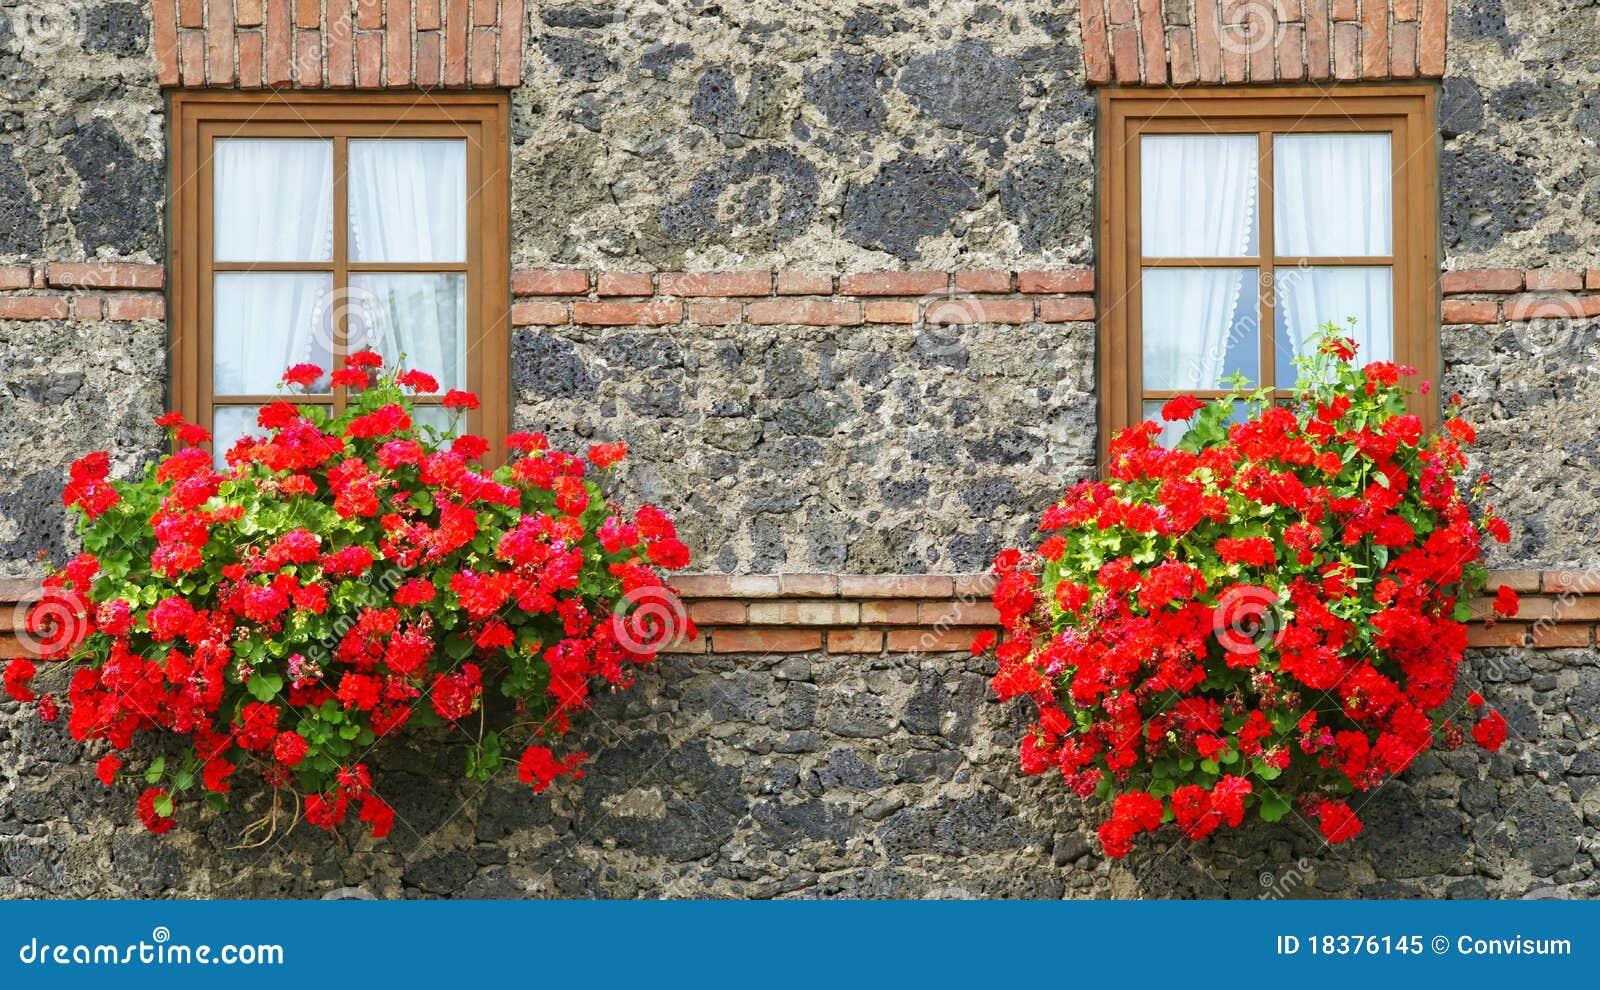 Building A Window Flower Box